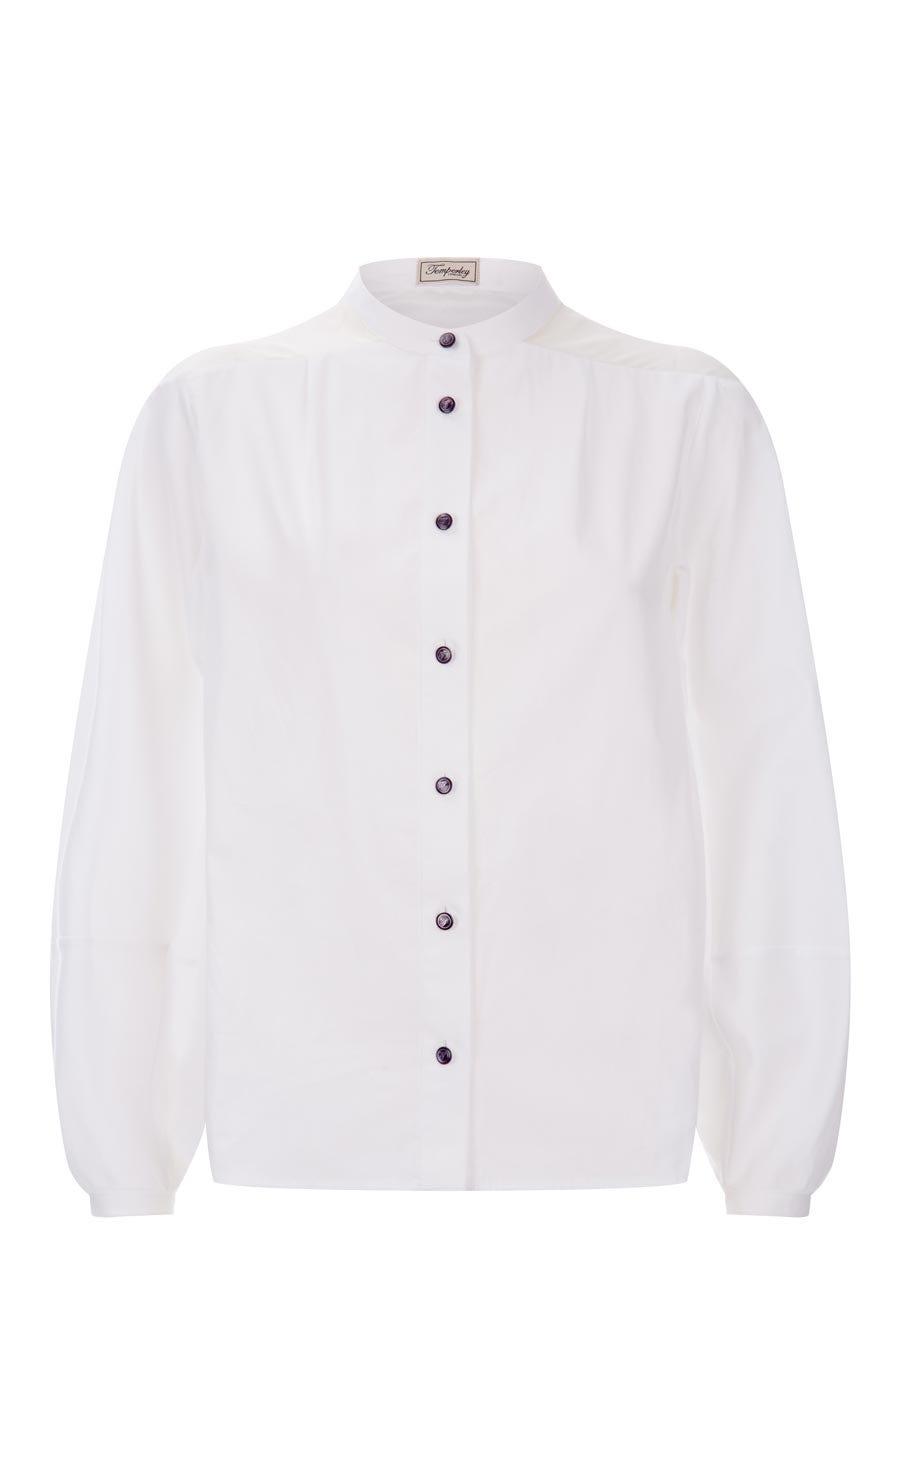 Enigma Sleeved Shirt, White